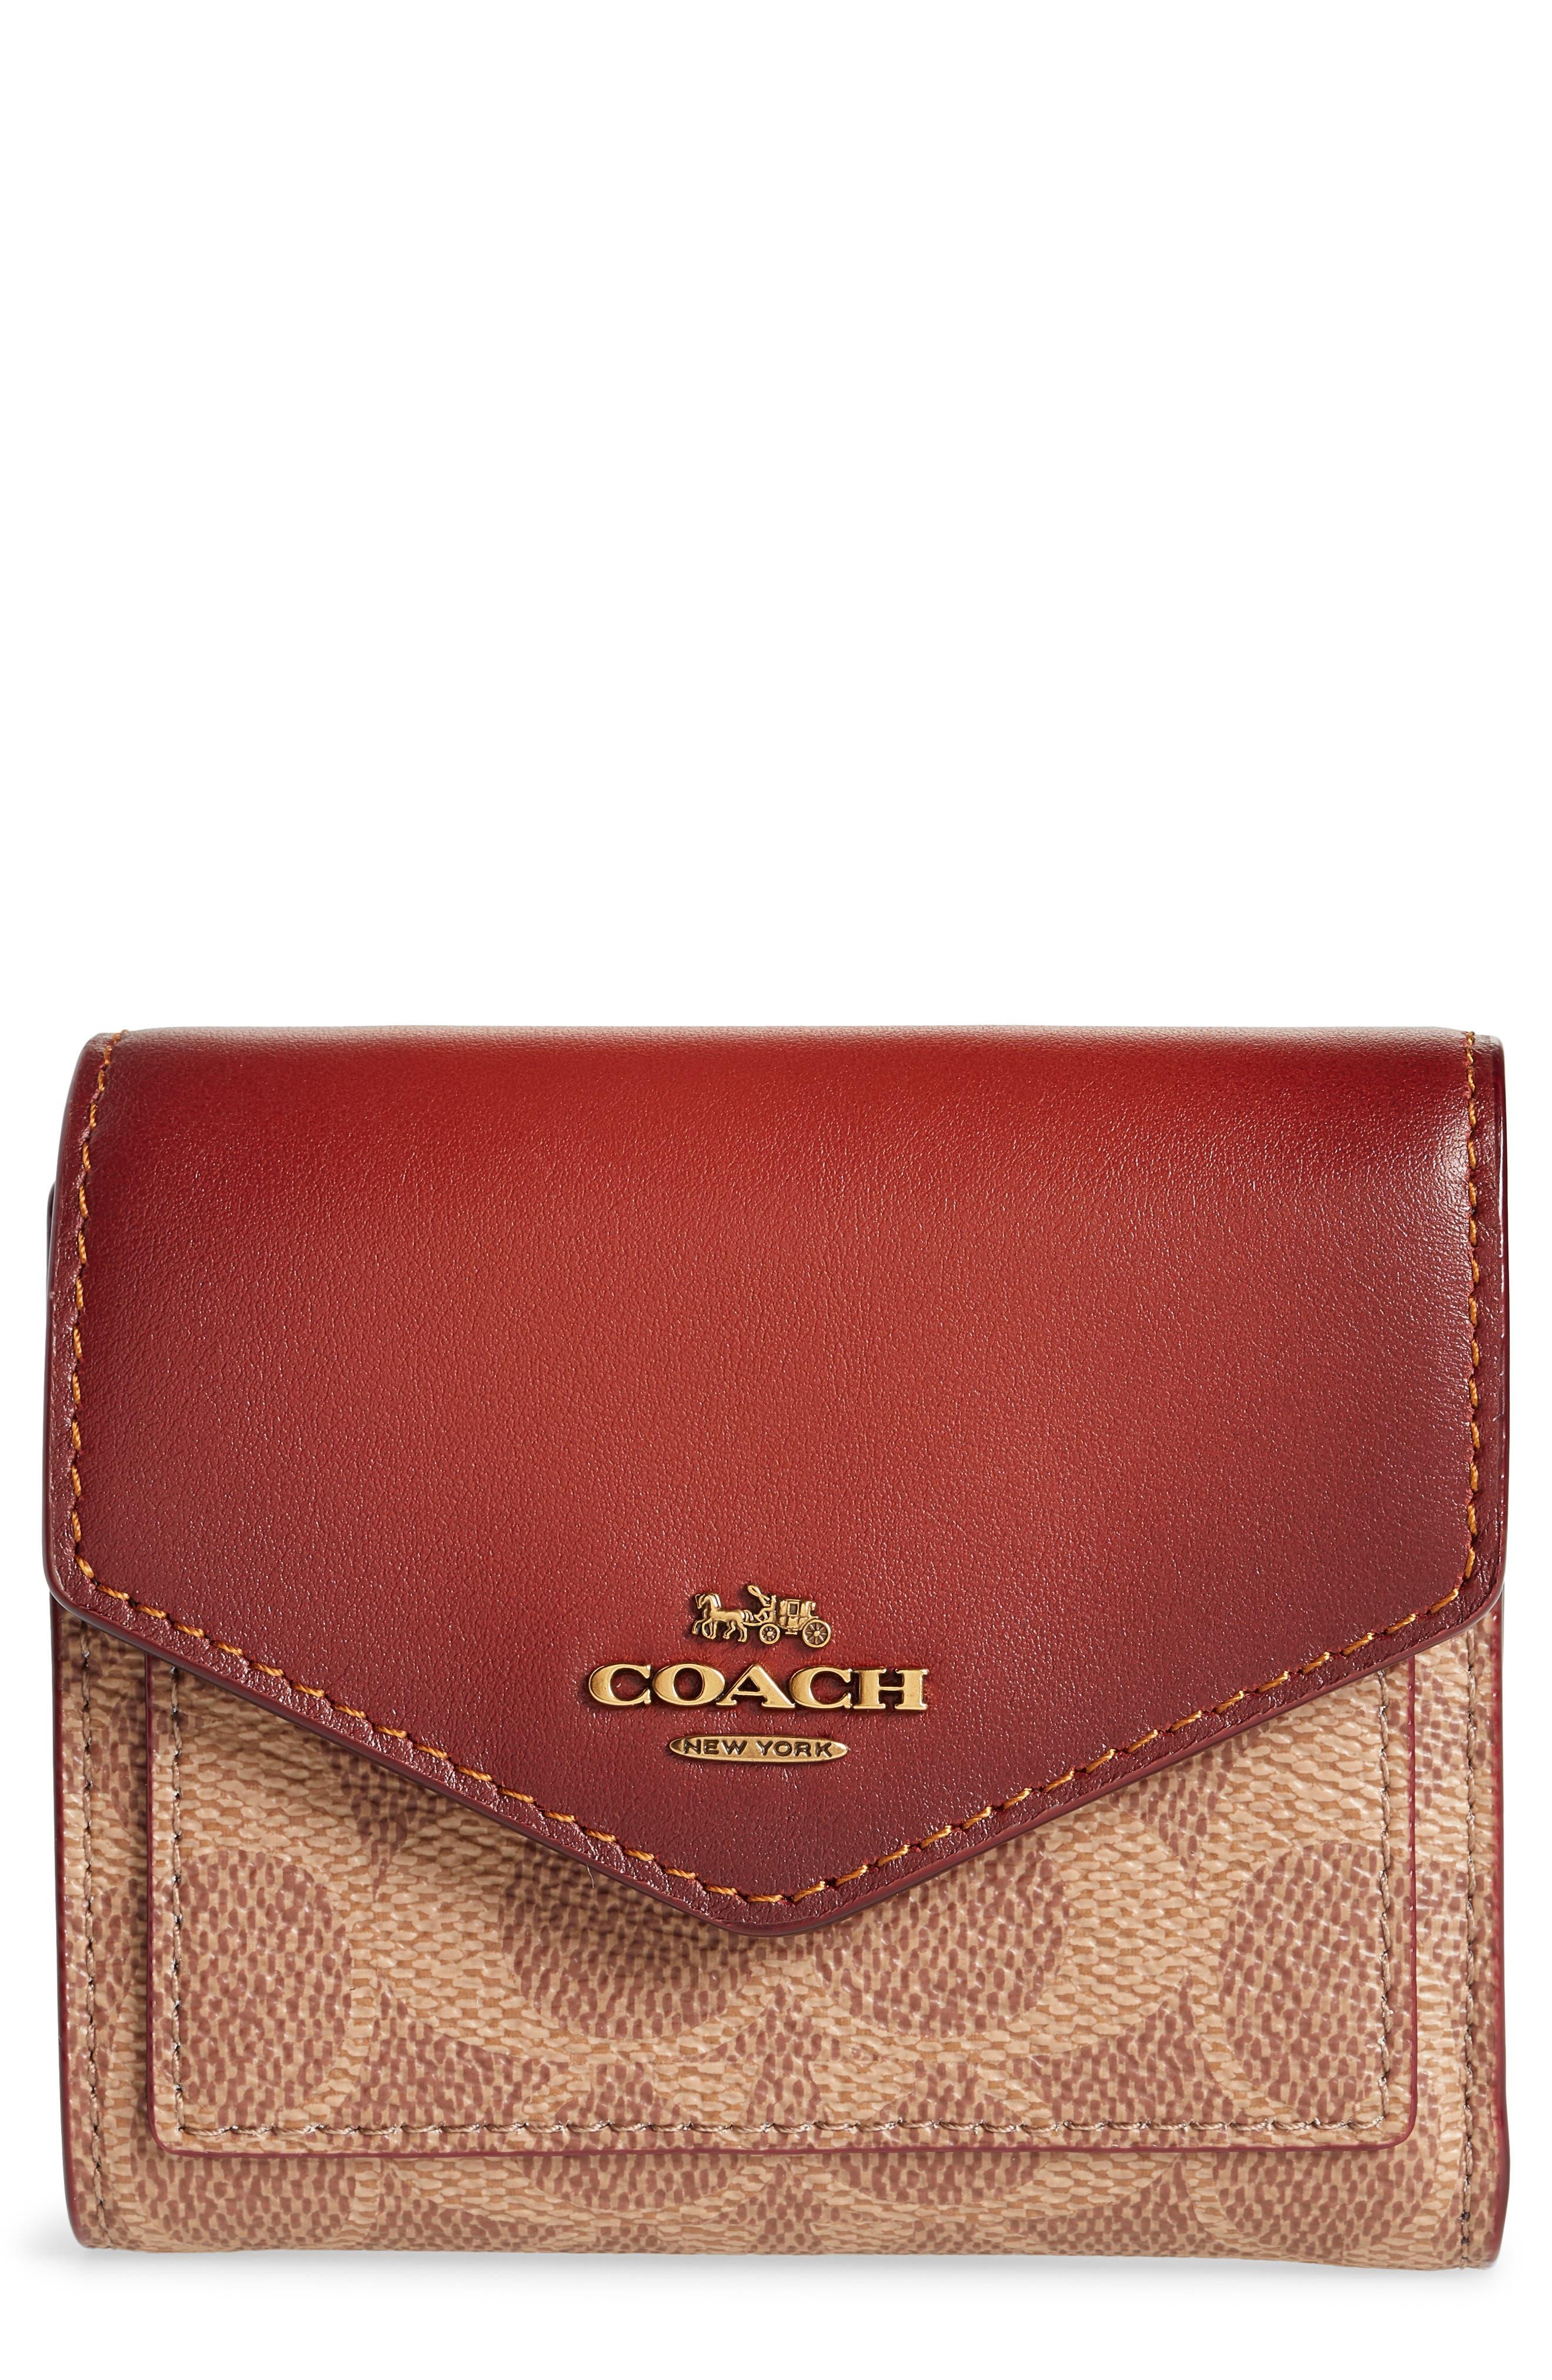 COACH, Colorblock Coated Canvas & Leather Flap Wallet, Main thumbnail 1, color, 201